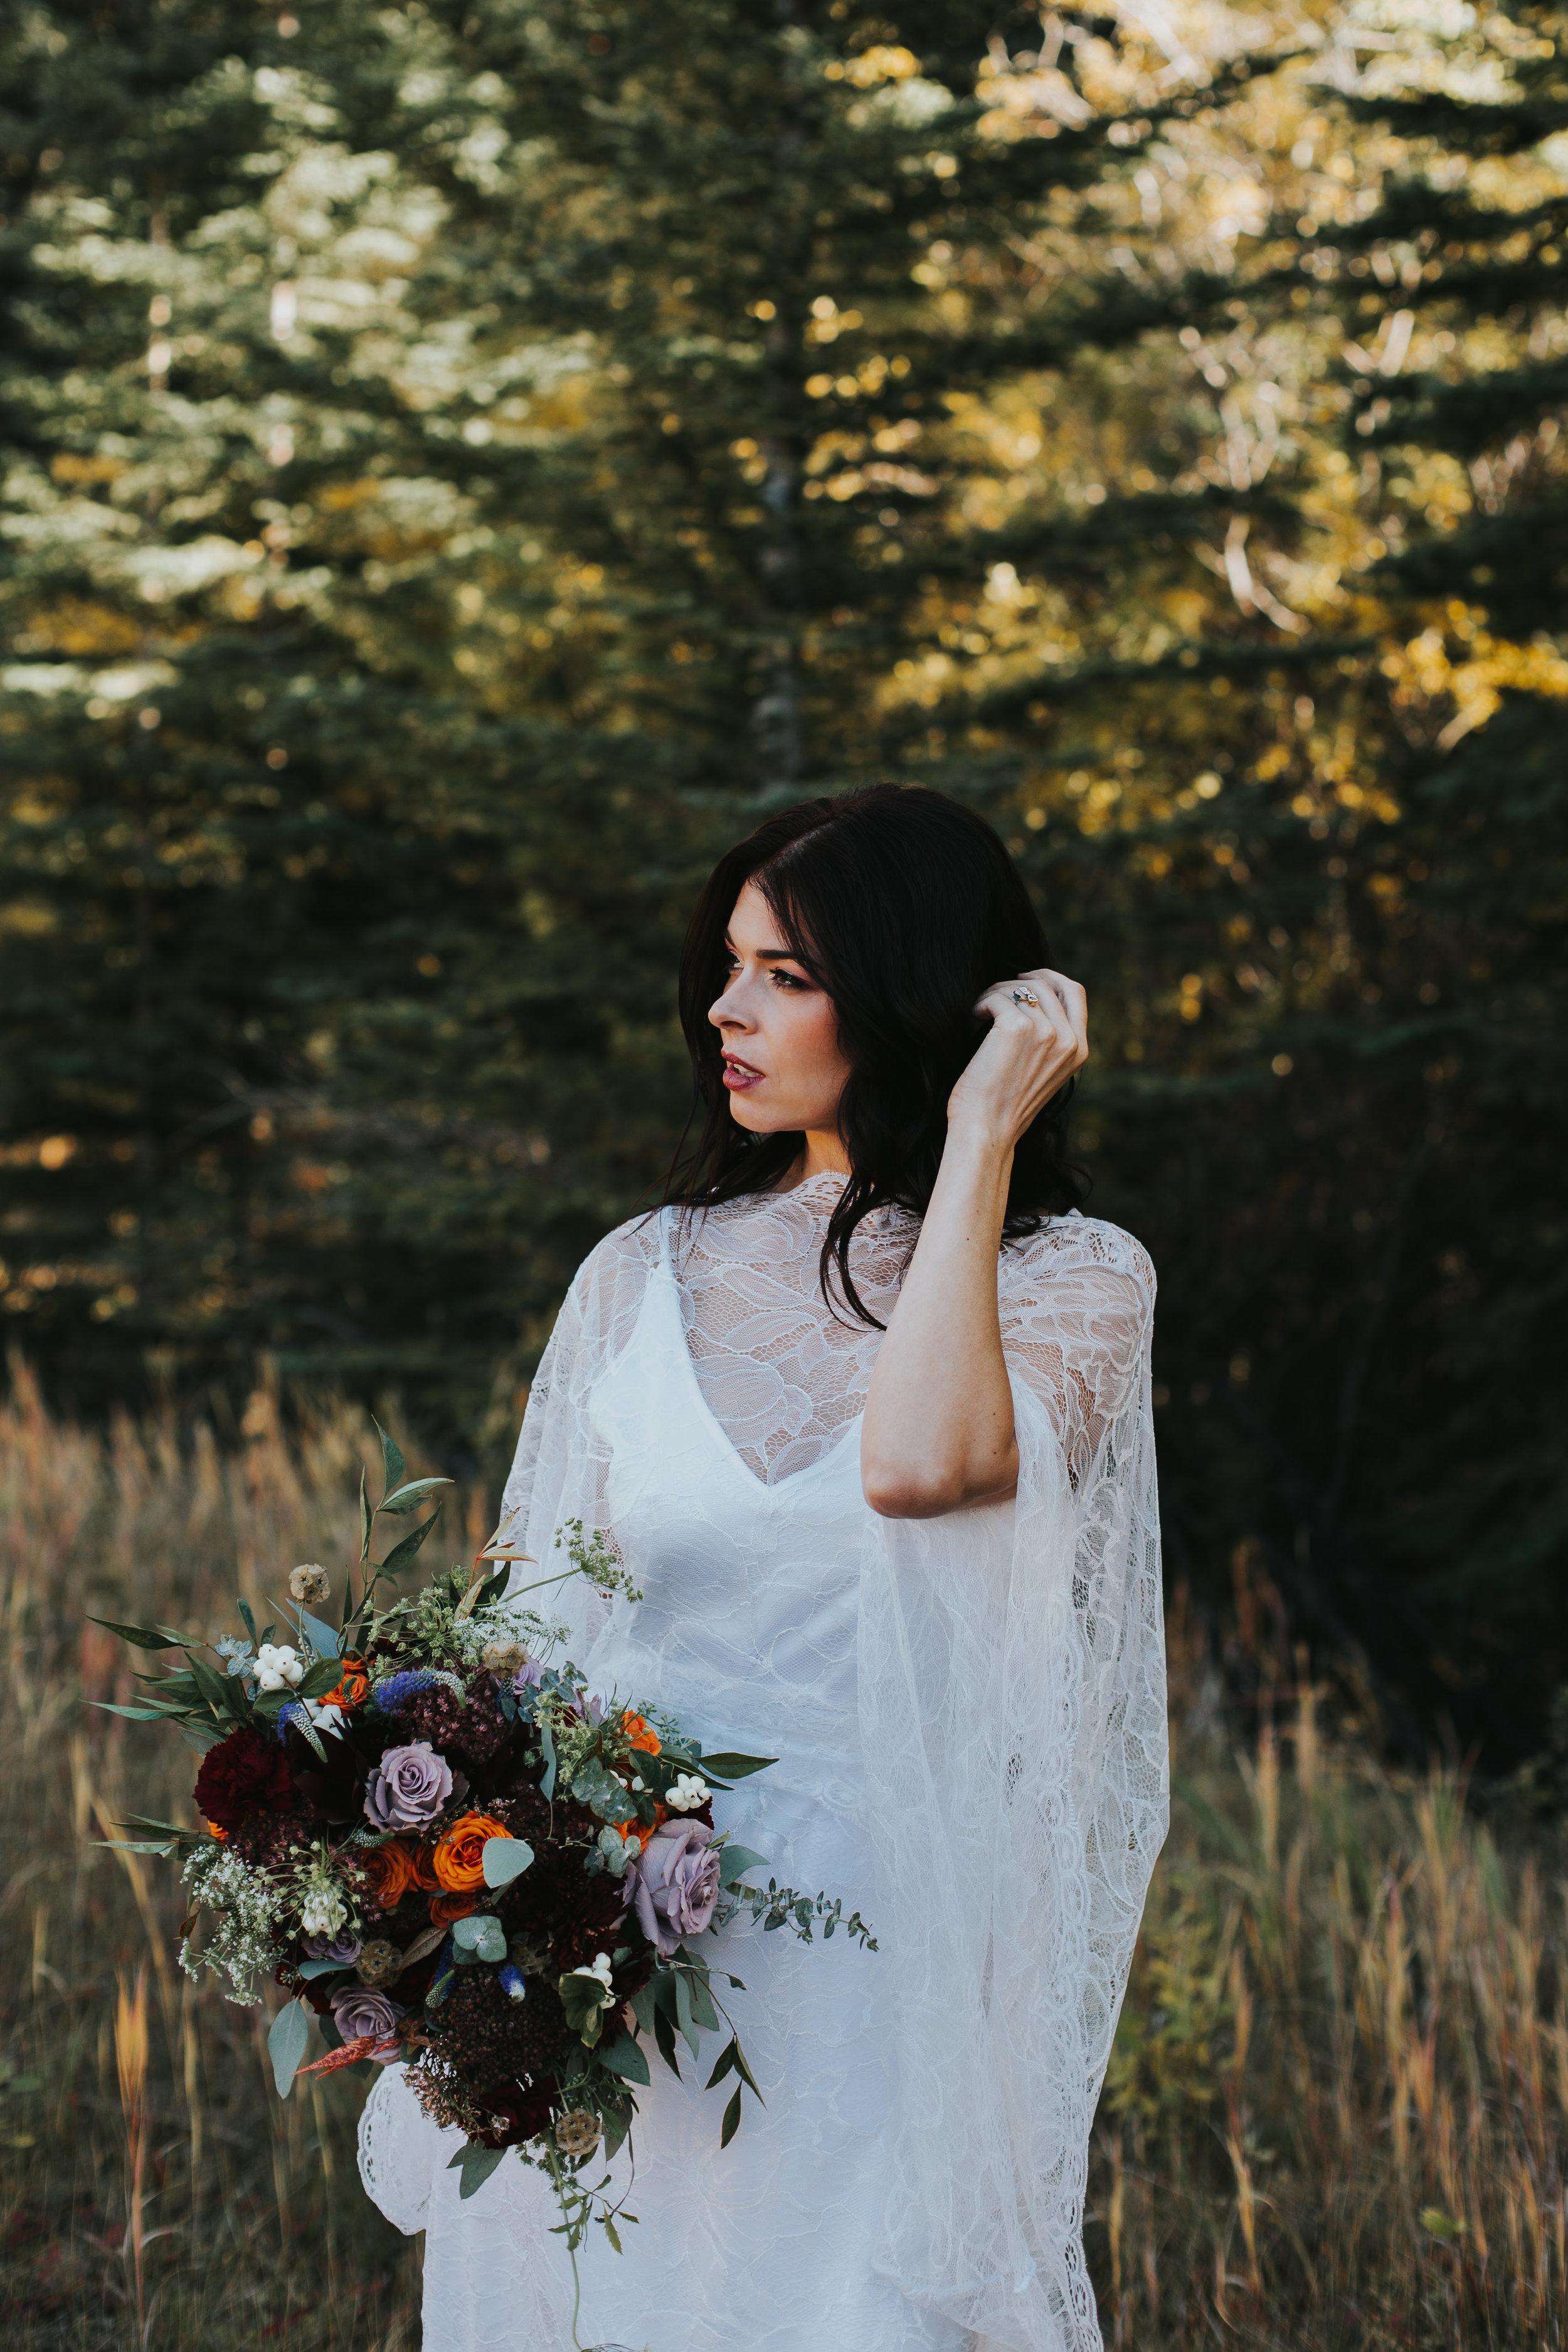 affordable wedding flowers in calgary, alberta